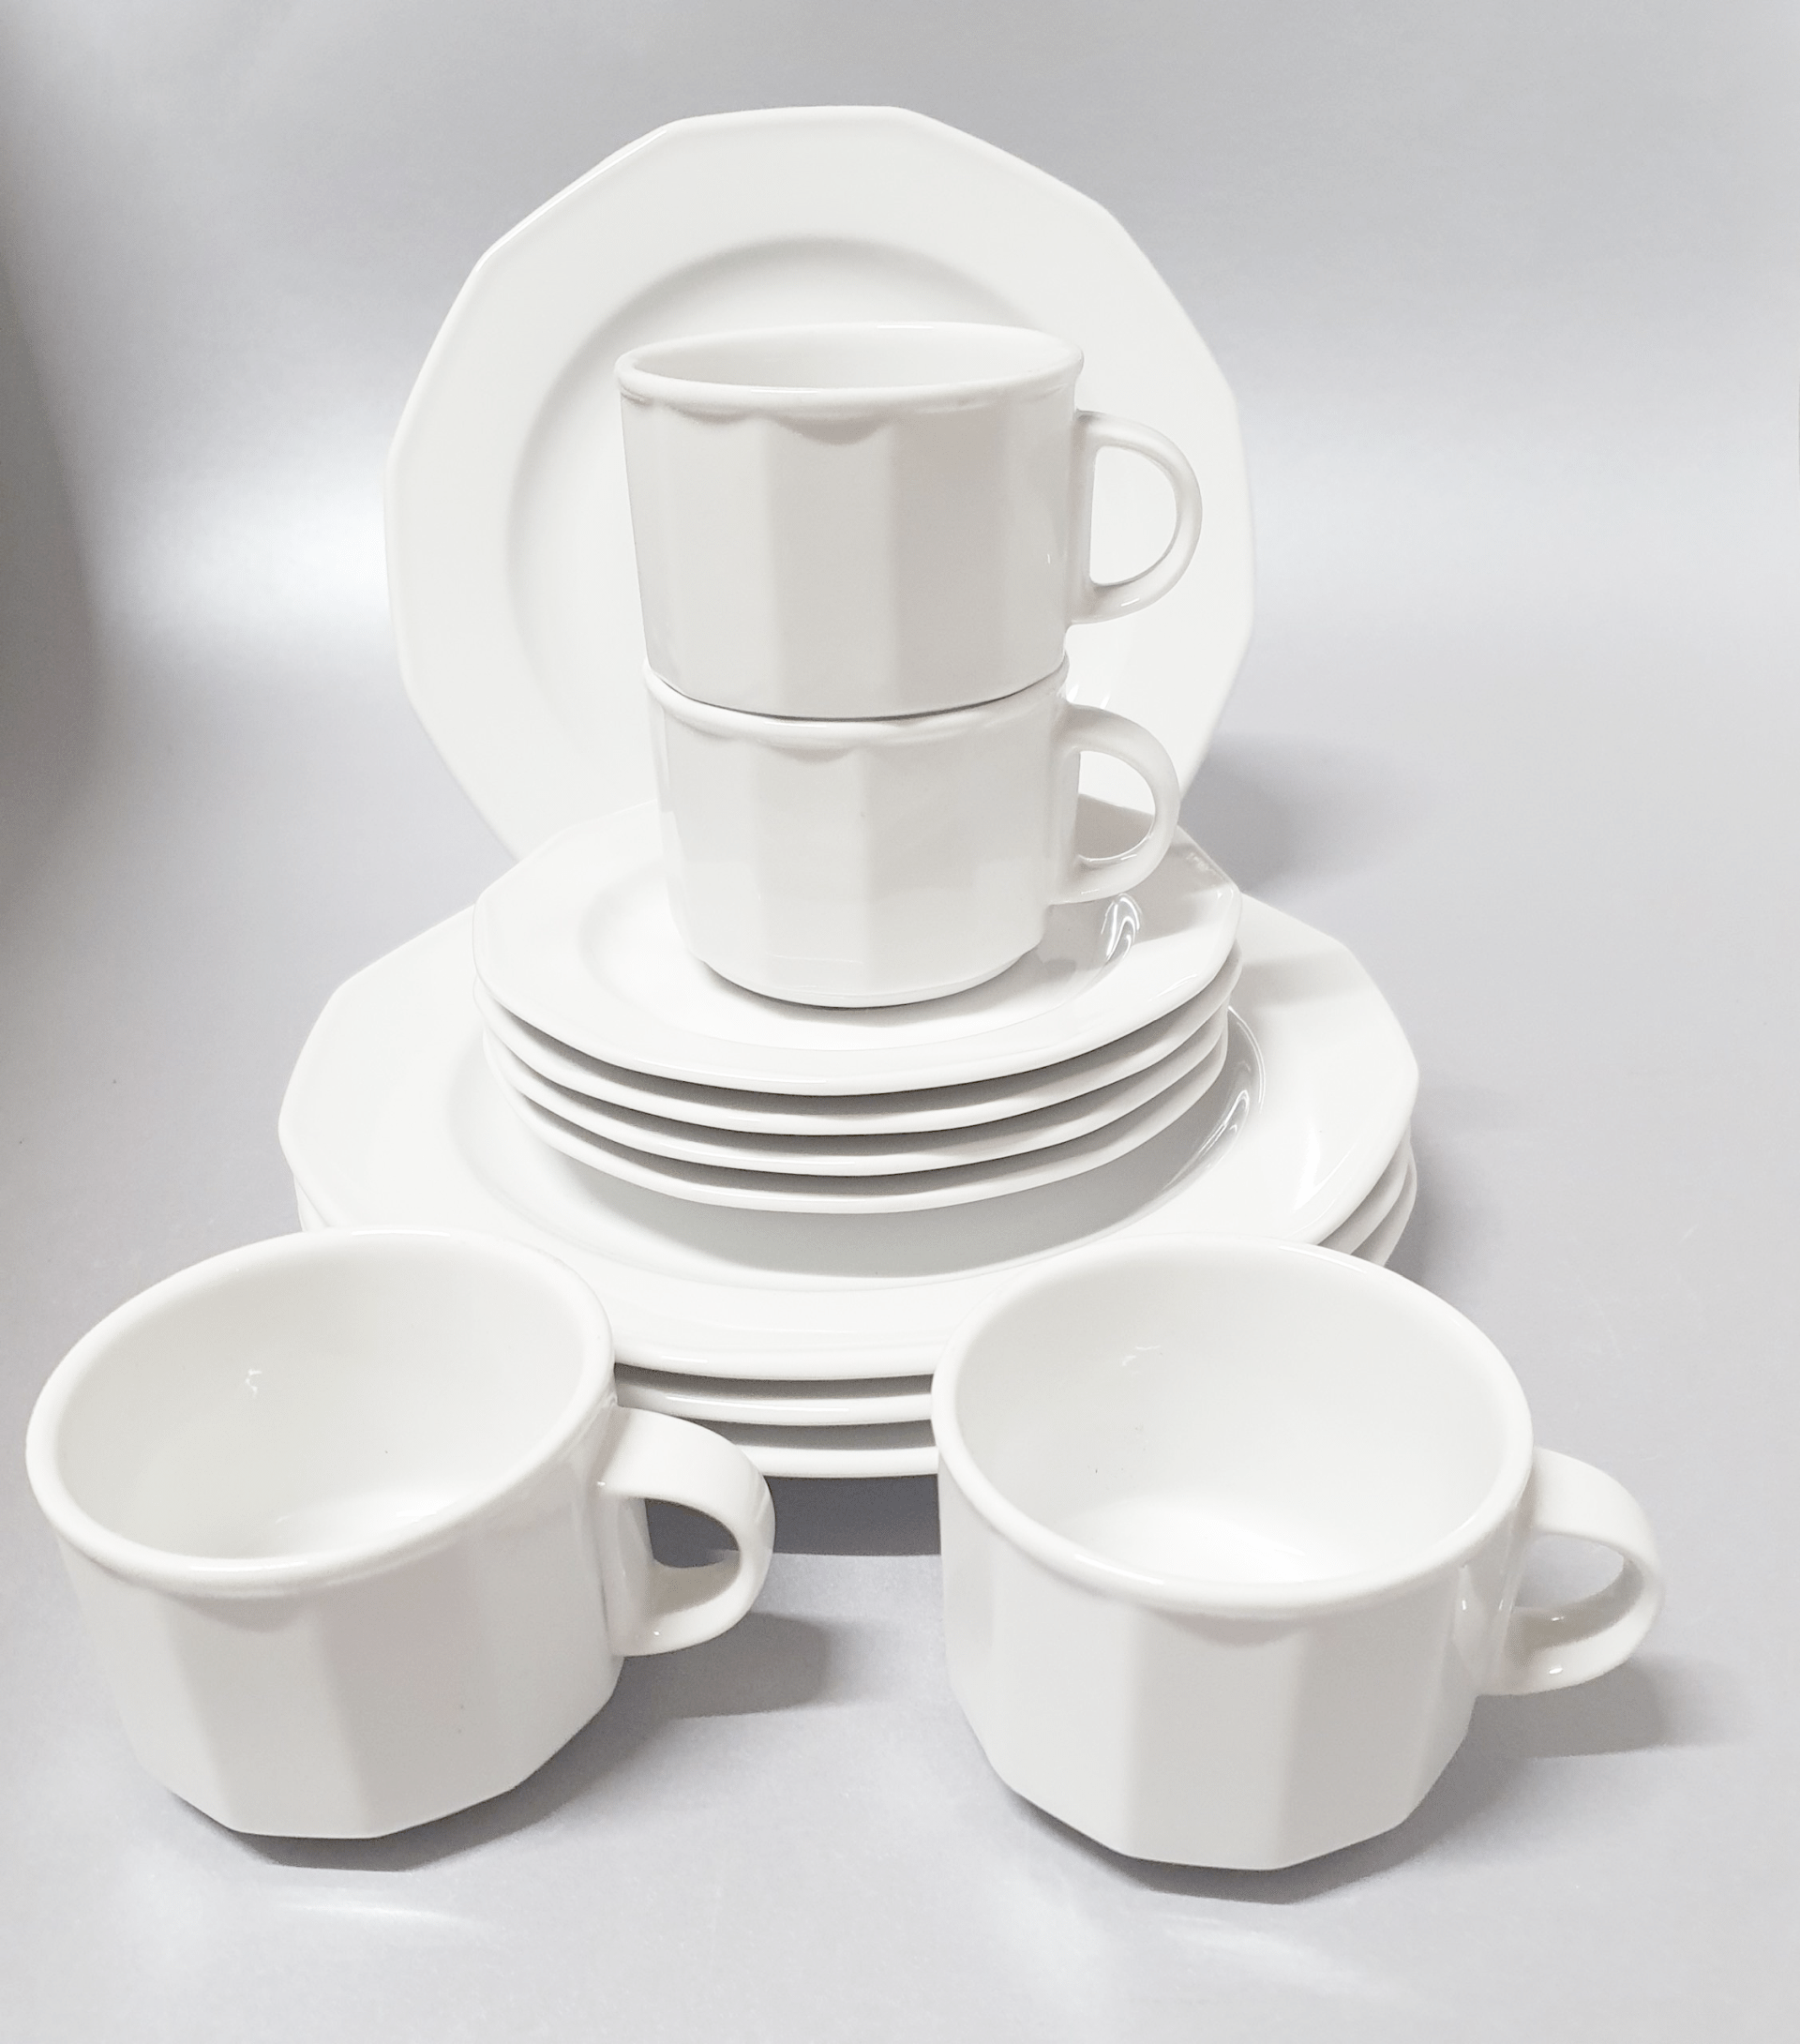 Lauanõude komplekt Merkury 4- le 12 osa Сервиз фарфоровой посуды 12